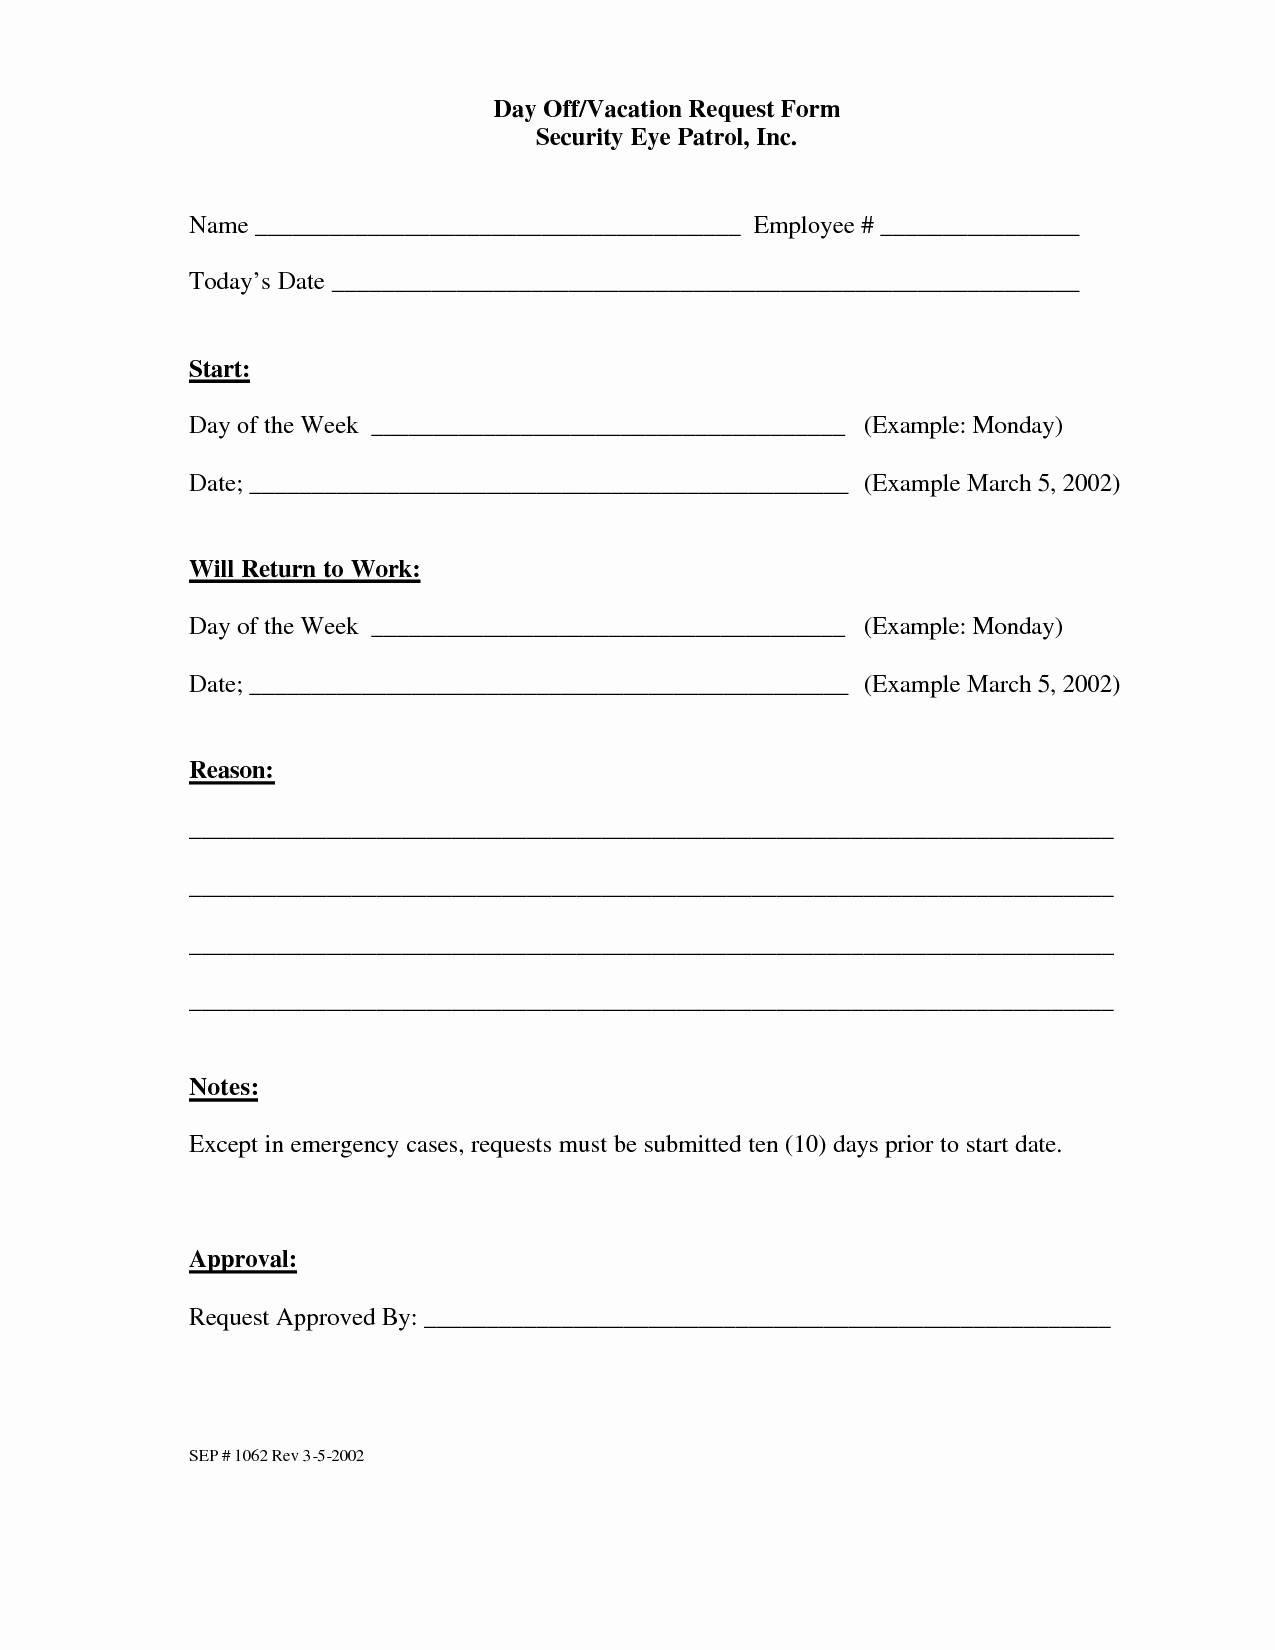 news letter template example-Business Newsletter Template Valid Transmittal Sheet Template Best 0d E3159fe B Db2b80 Lovely Free 19-p